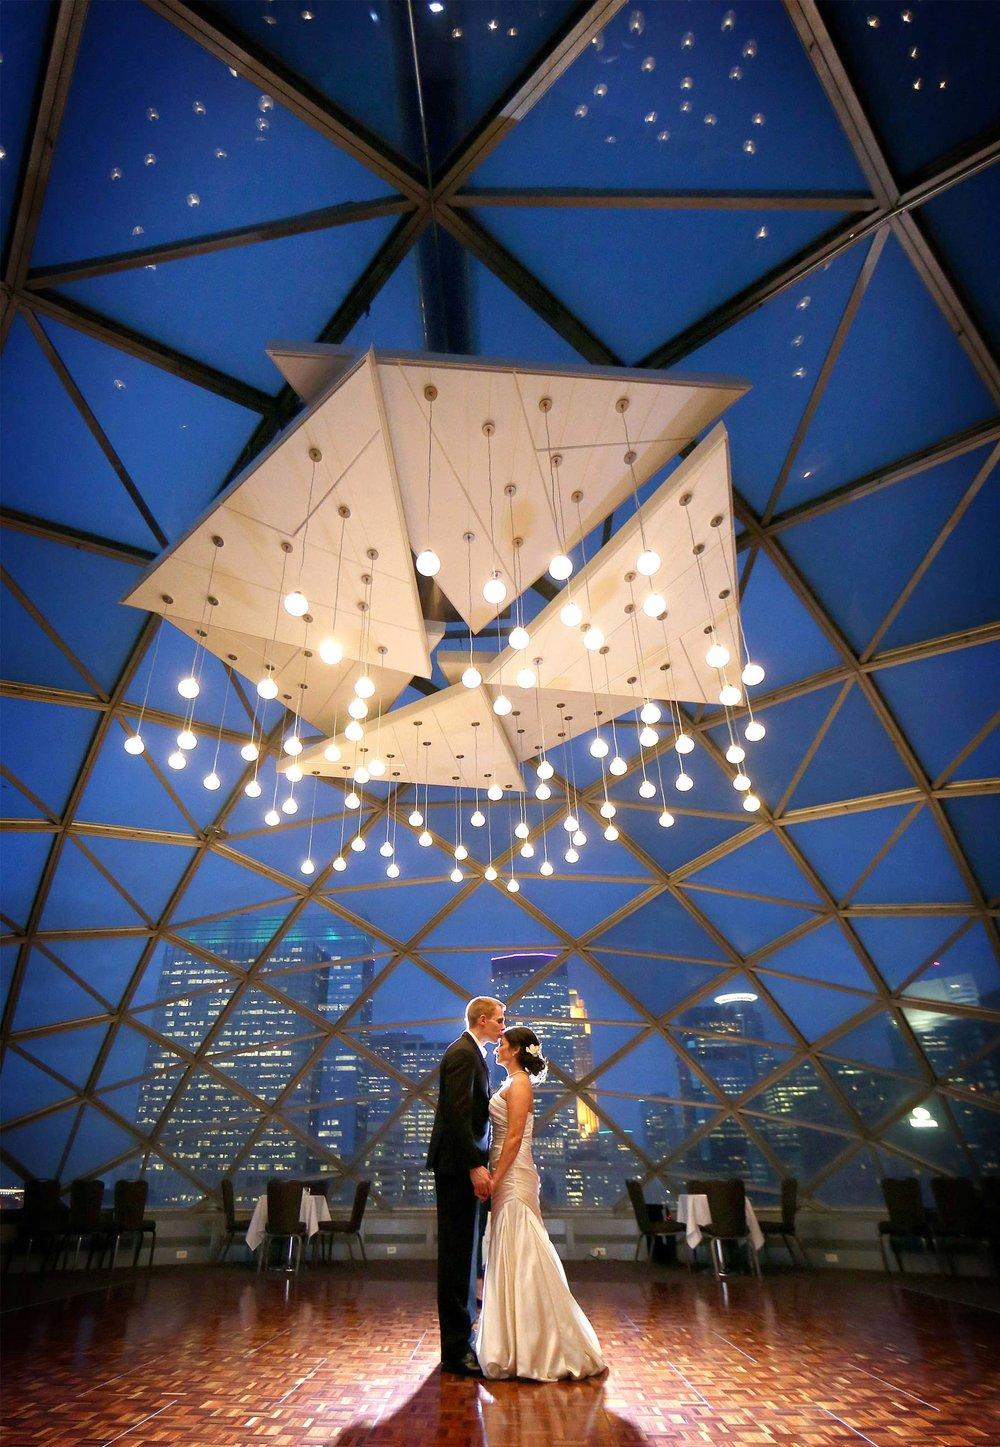 25-Minneapolis-Minnesota-Wedding-Photographer-by-Andrew-Vick-Photography-Fall-Autumn-Millennium-Hotel-Reception-Bride-Groom-Dance-Night-Skyline-Kiss-Vintage-Amanda-and-Cary.jpg